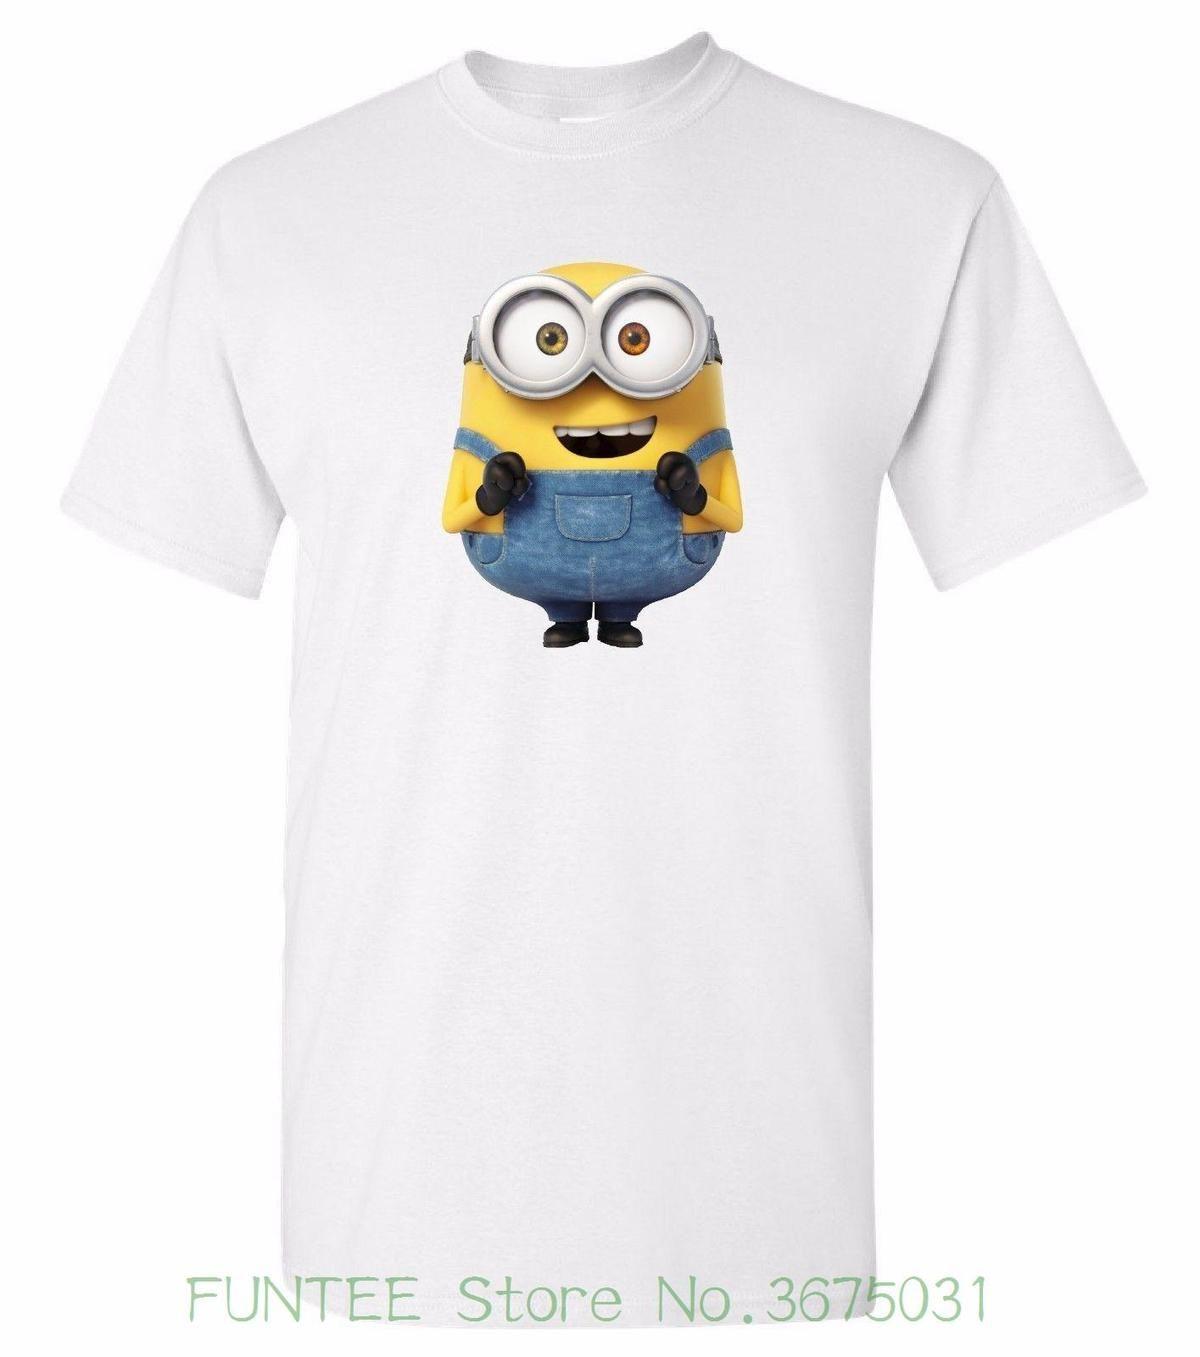 Women S Tee Minion Bob White T Shirt 100 Cotton Tee By Bmf Apparel